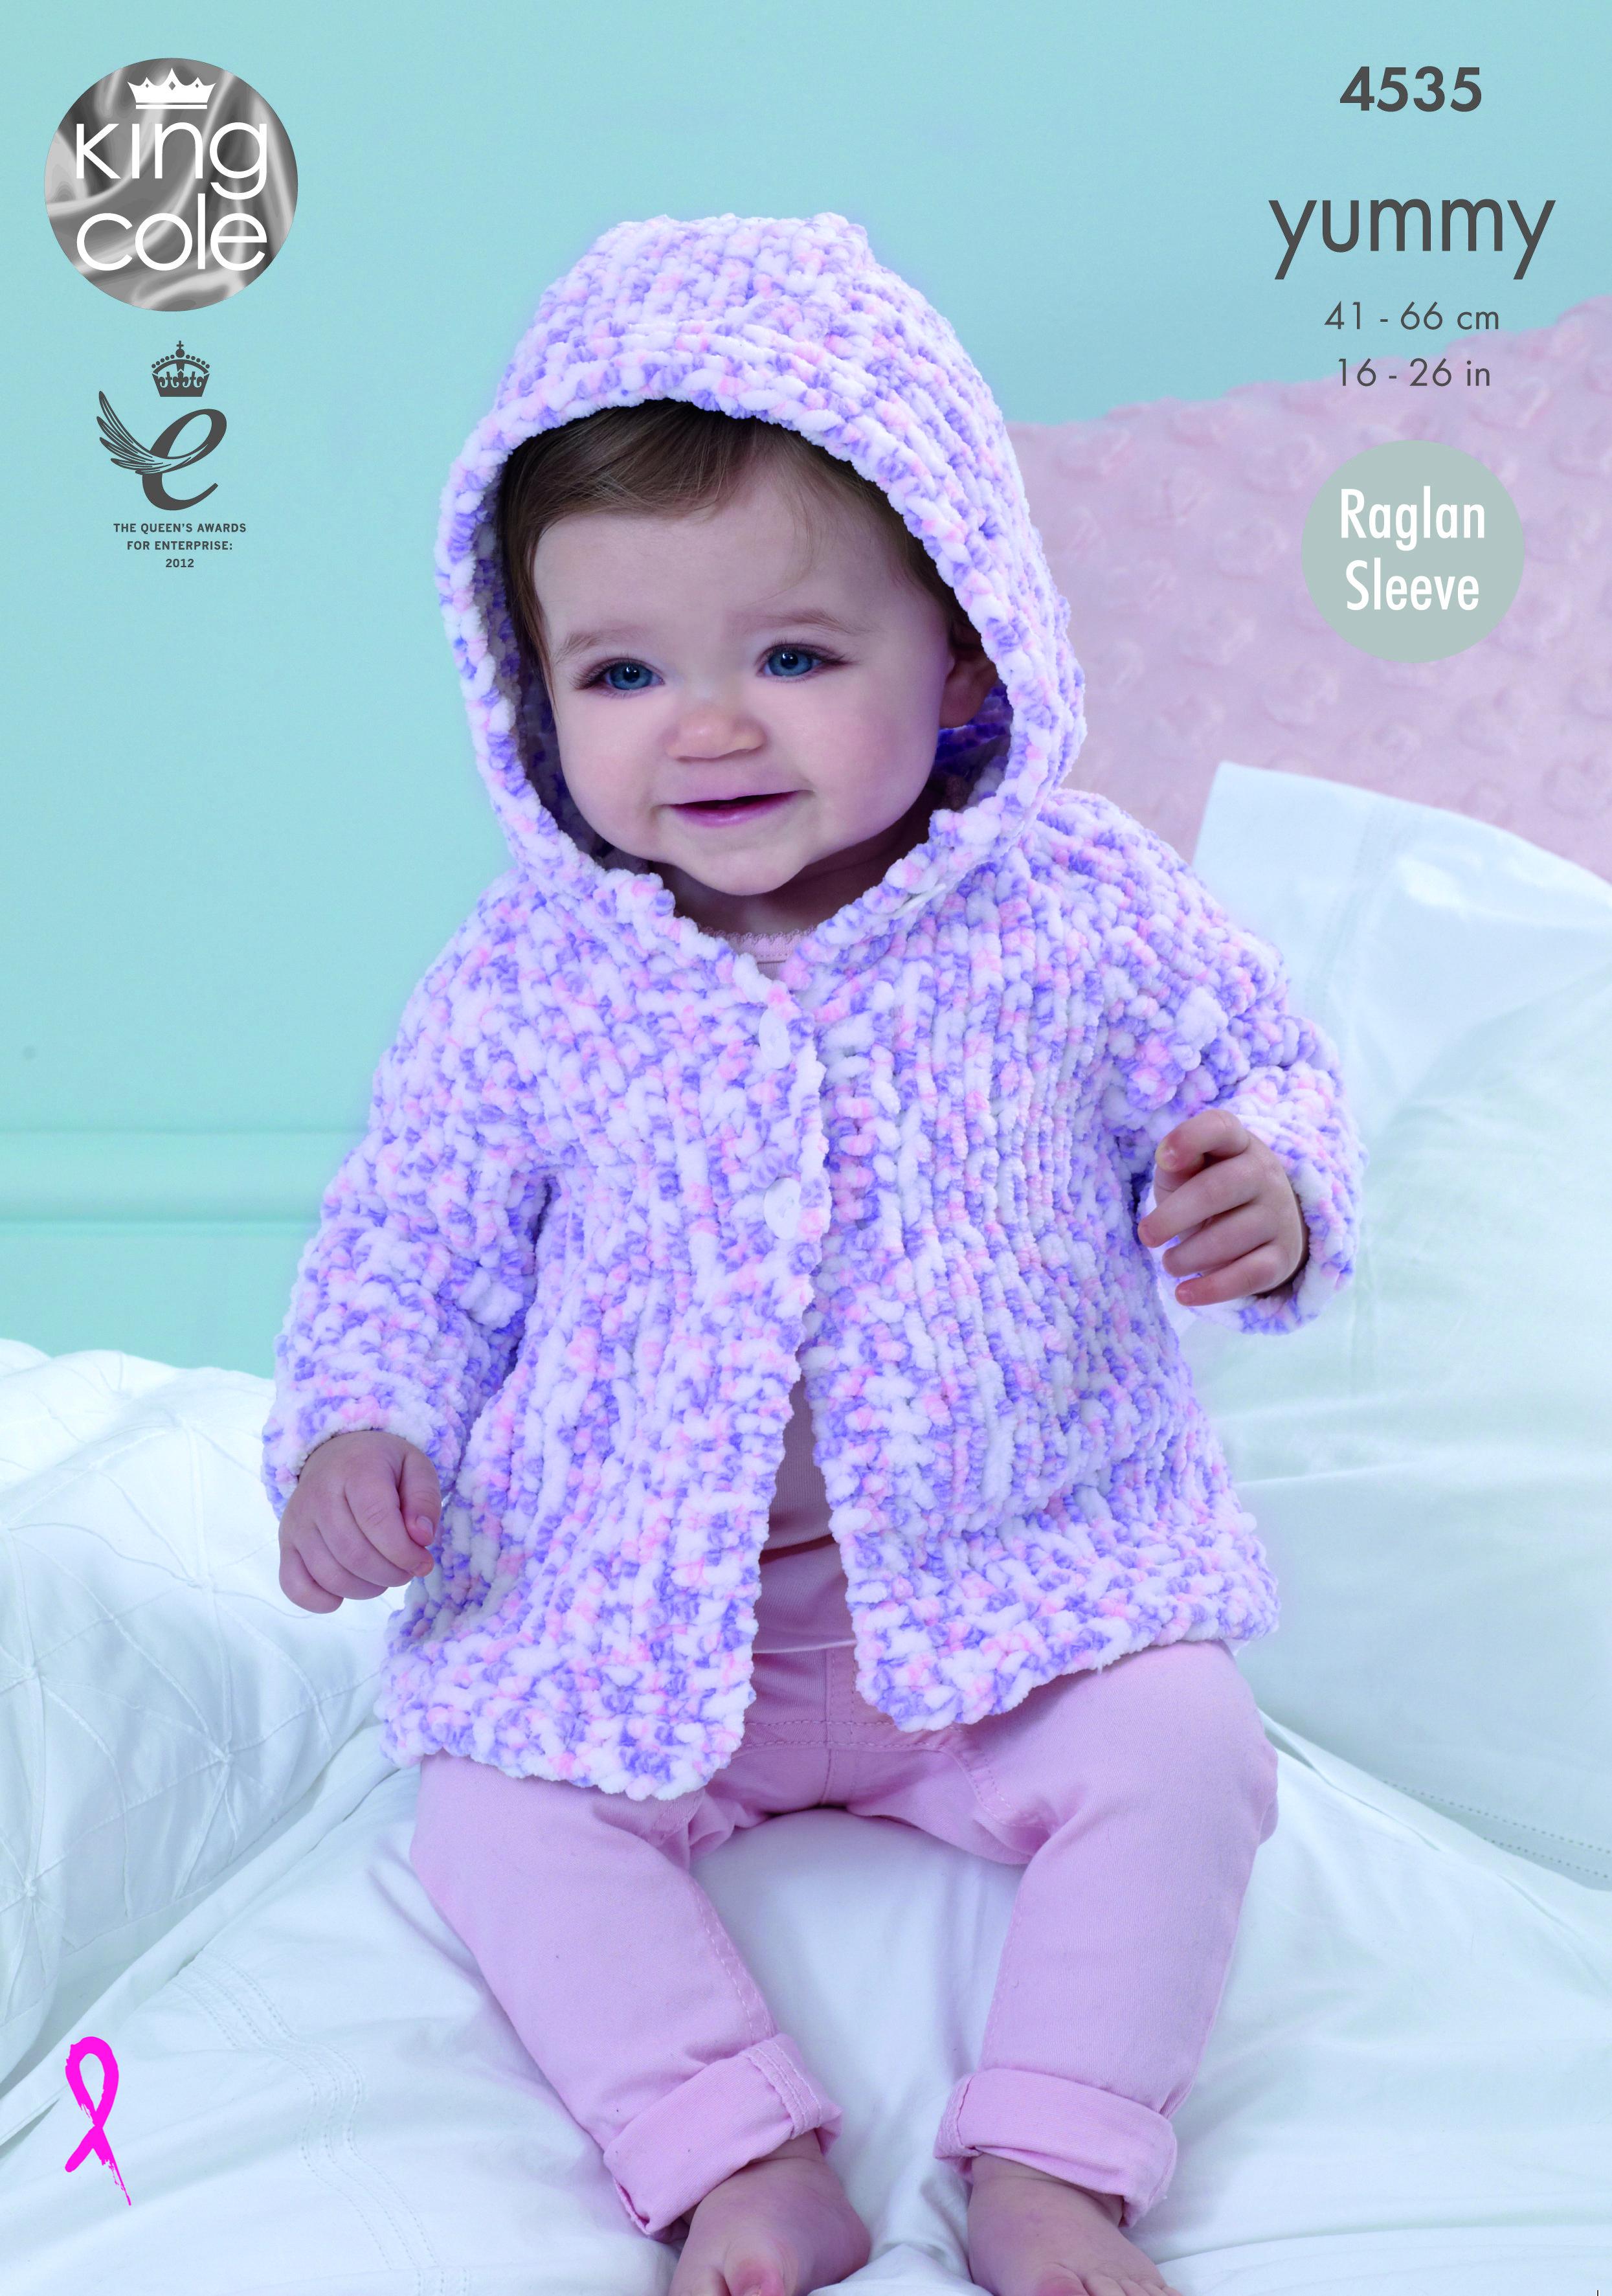 King Cole Baby Knitting Pattern Raglan Sleeve Hooded Jacket Cardigan Yummy 4535